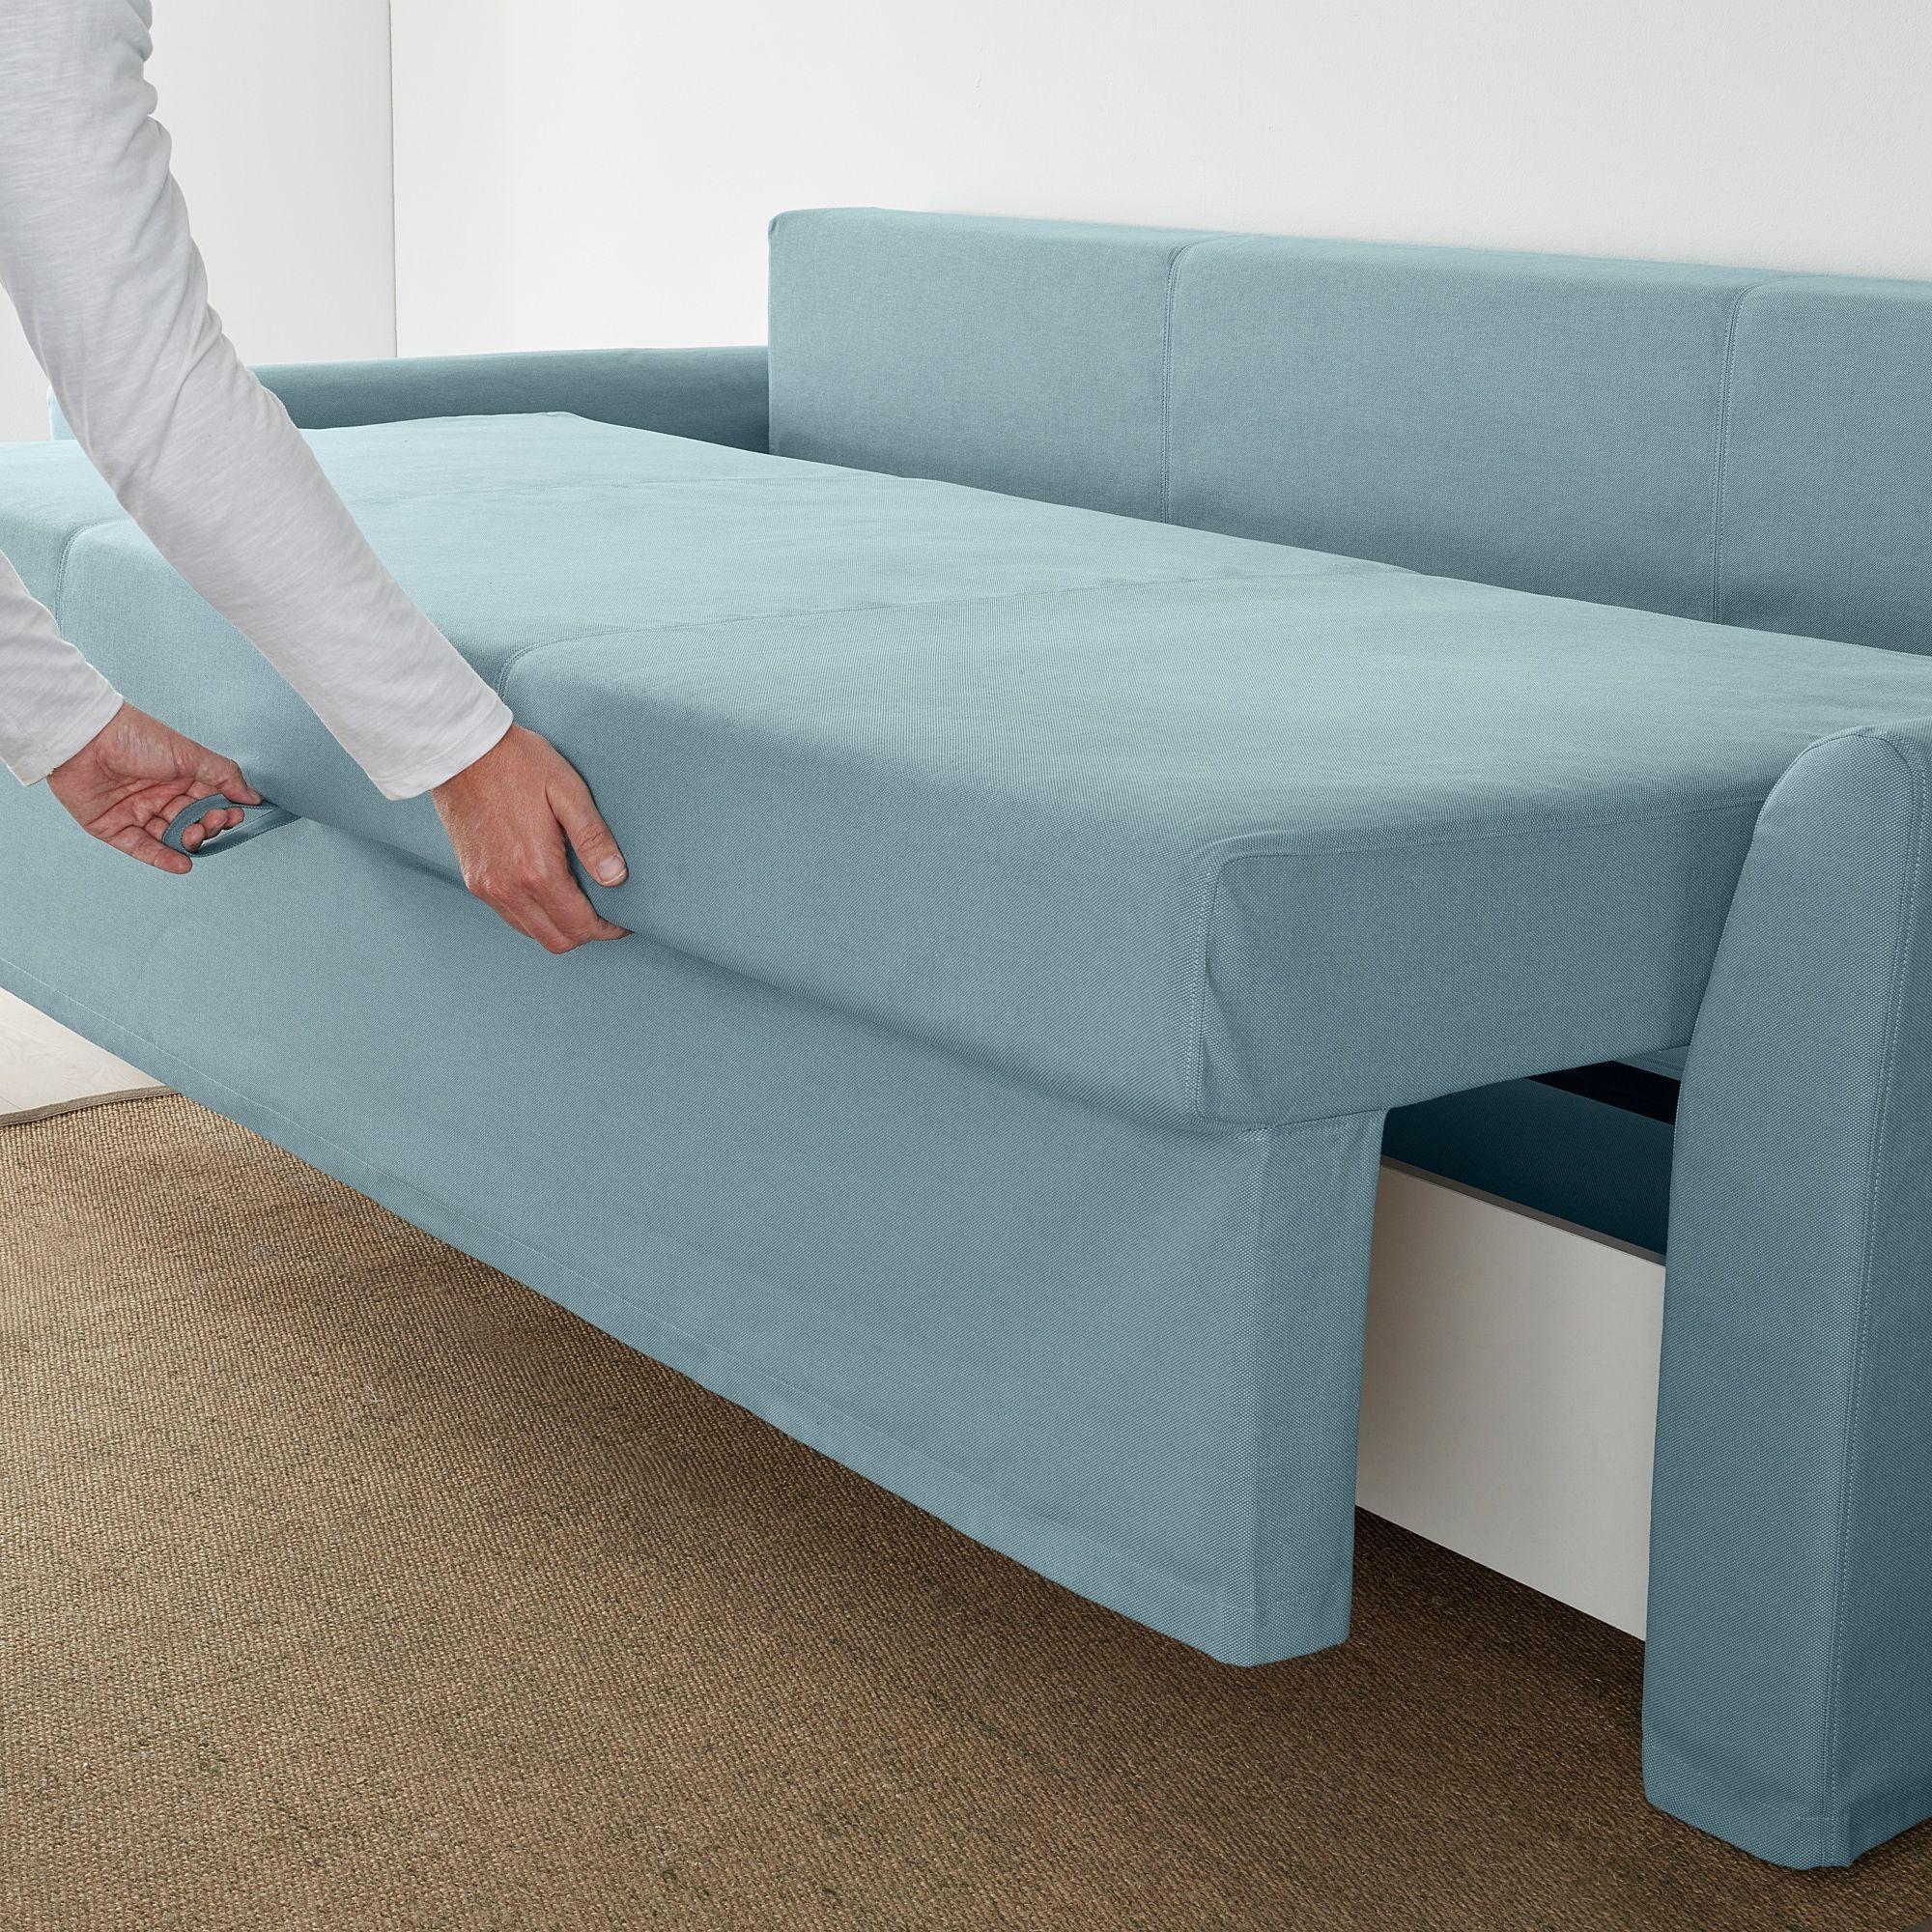 HOLMSUND Sleeper sofa, Orrsta light blue IKEA in 2020